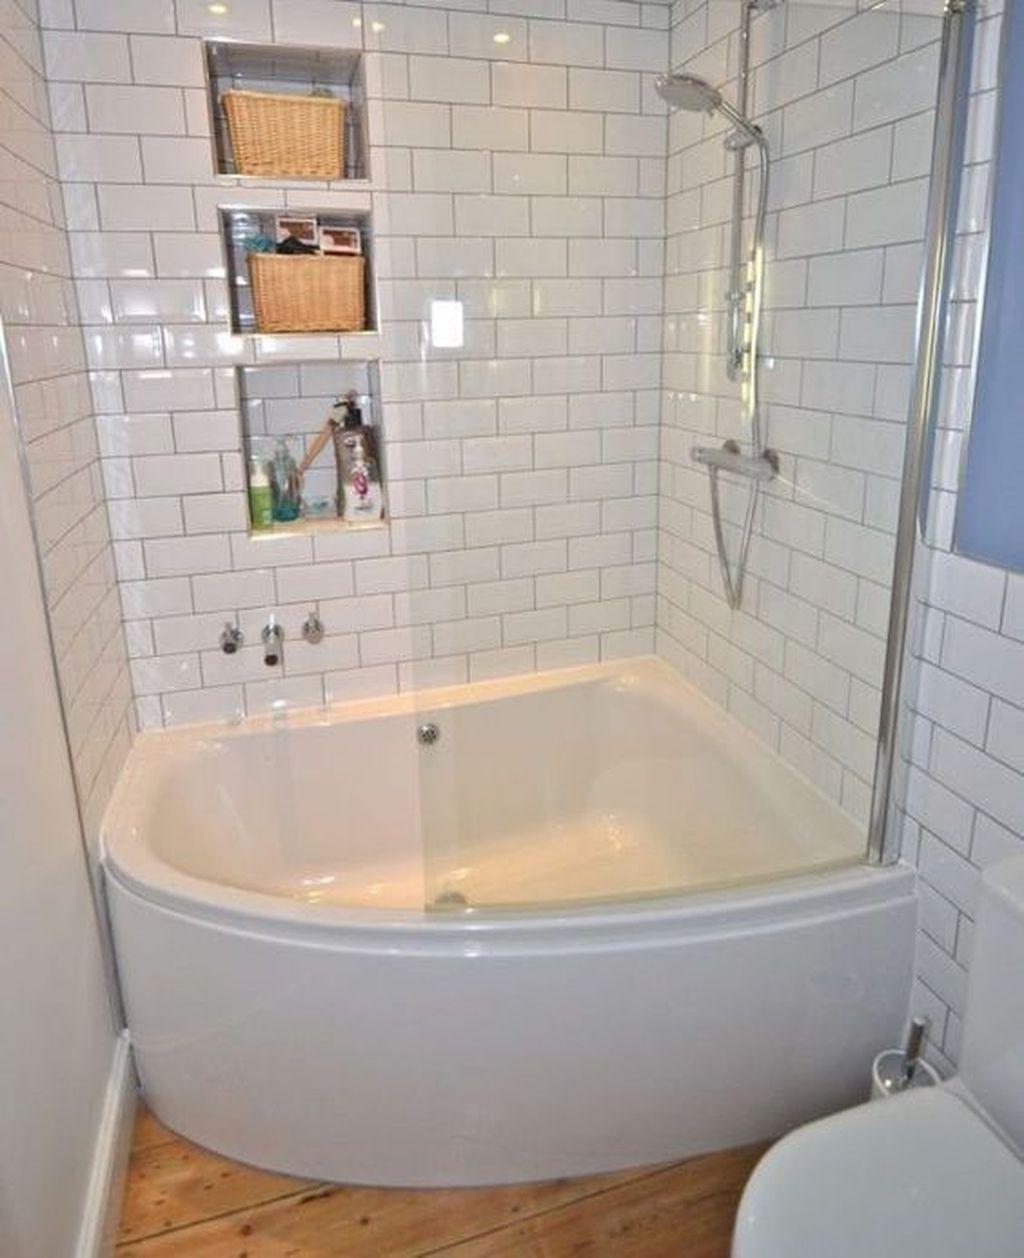 20 Stylish Small Bathroom Design Ideas On A Budget Bathroom Tub Shower Combo Small Bathroom Diy Small Bathroom Design